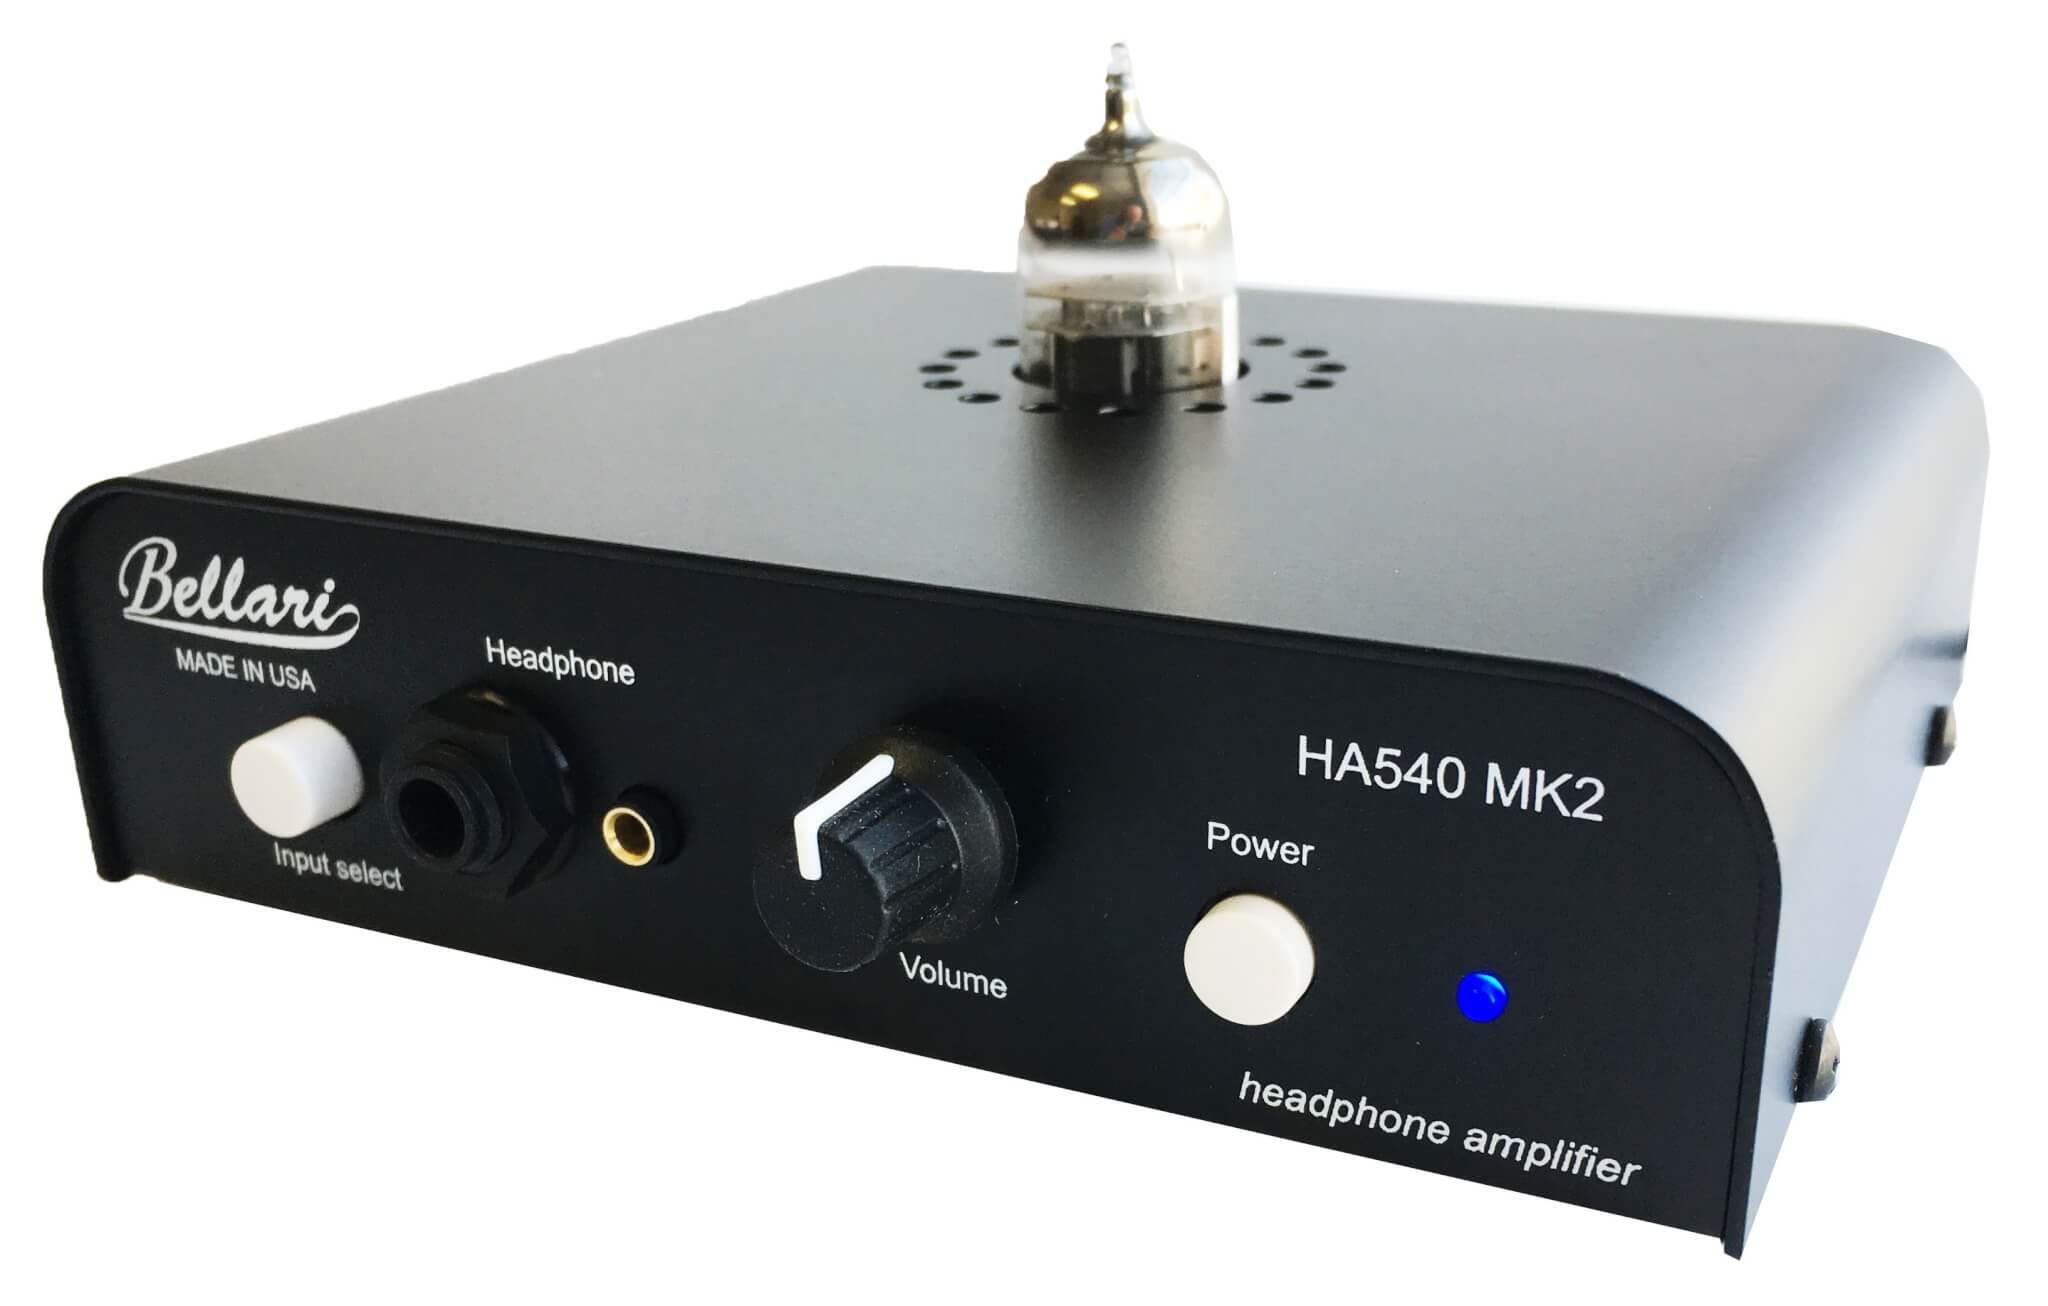 HA540 MK2 - Pure Class A Stereo Headphone Amplifier